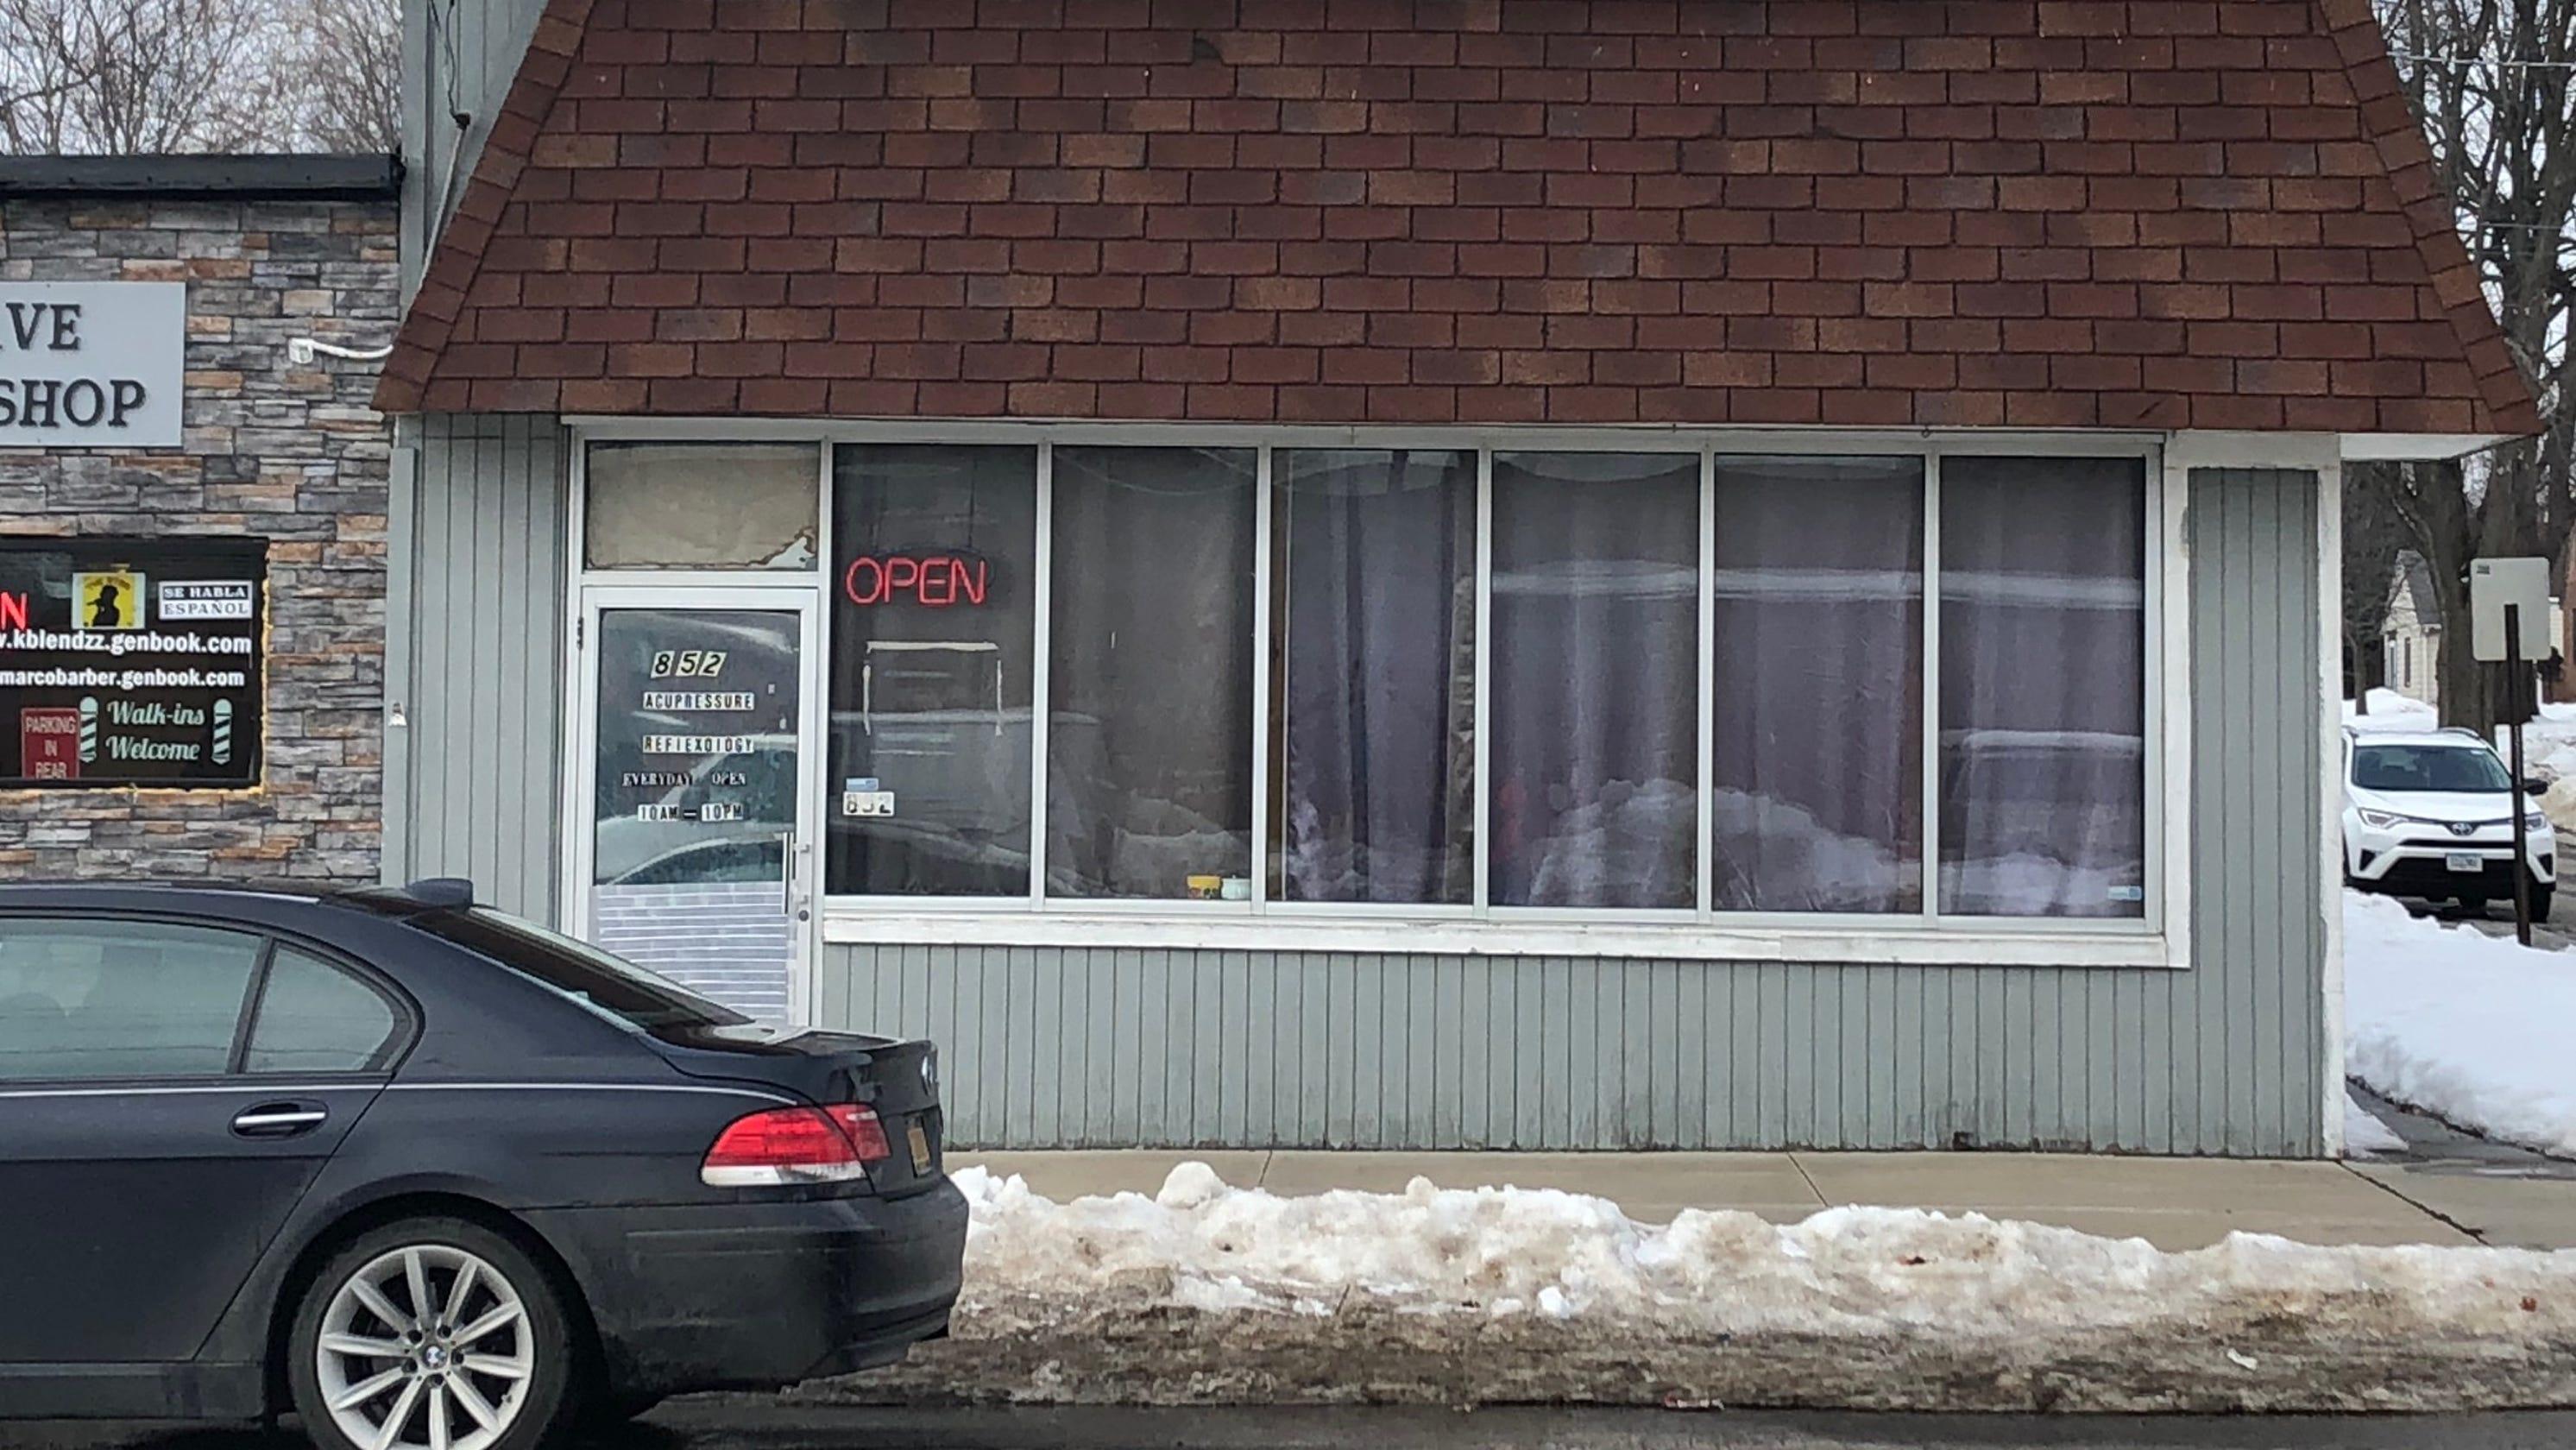 Sex trafficking in Iowa: Watchdog sent customers into 3